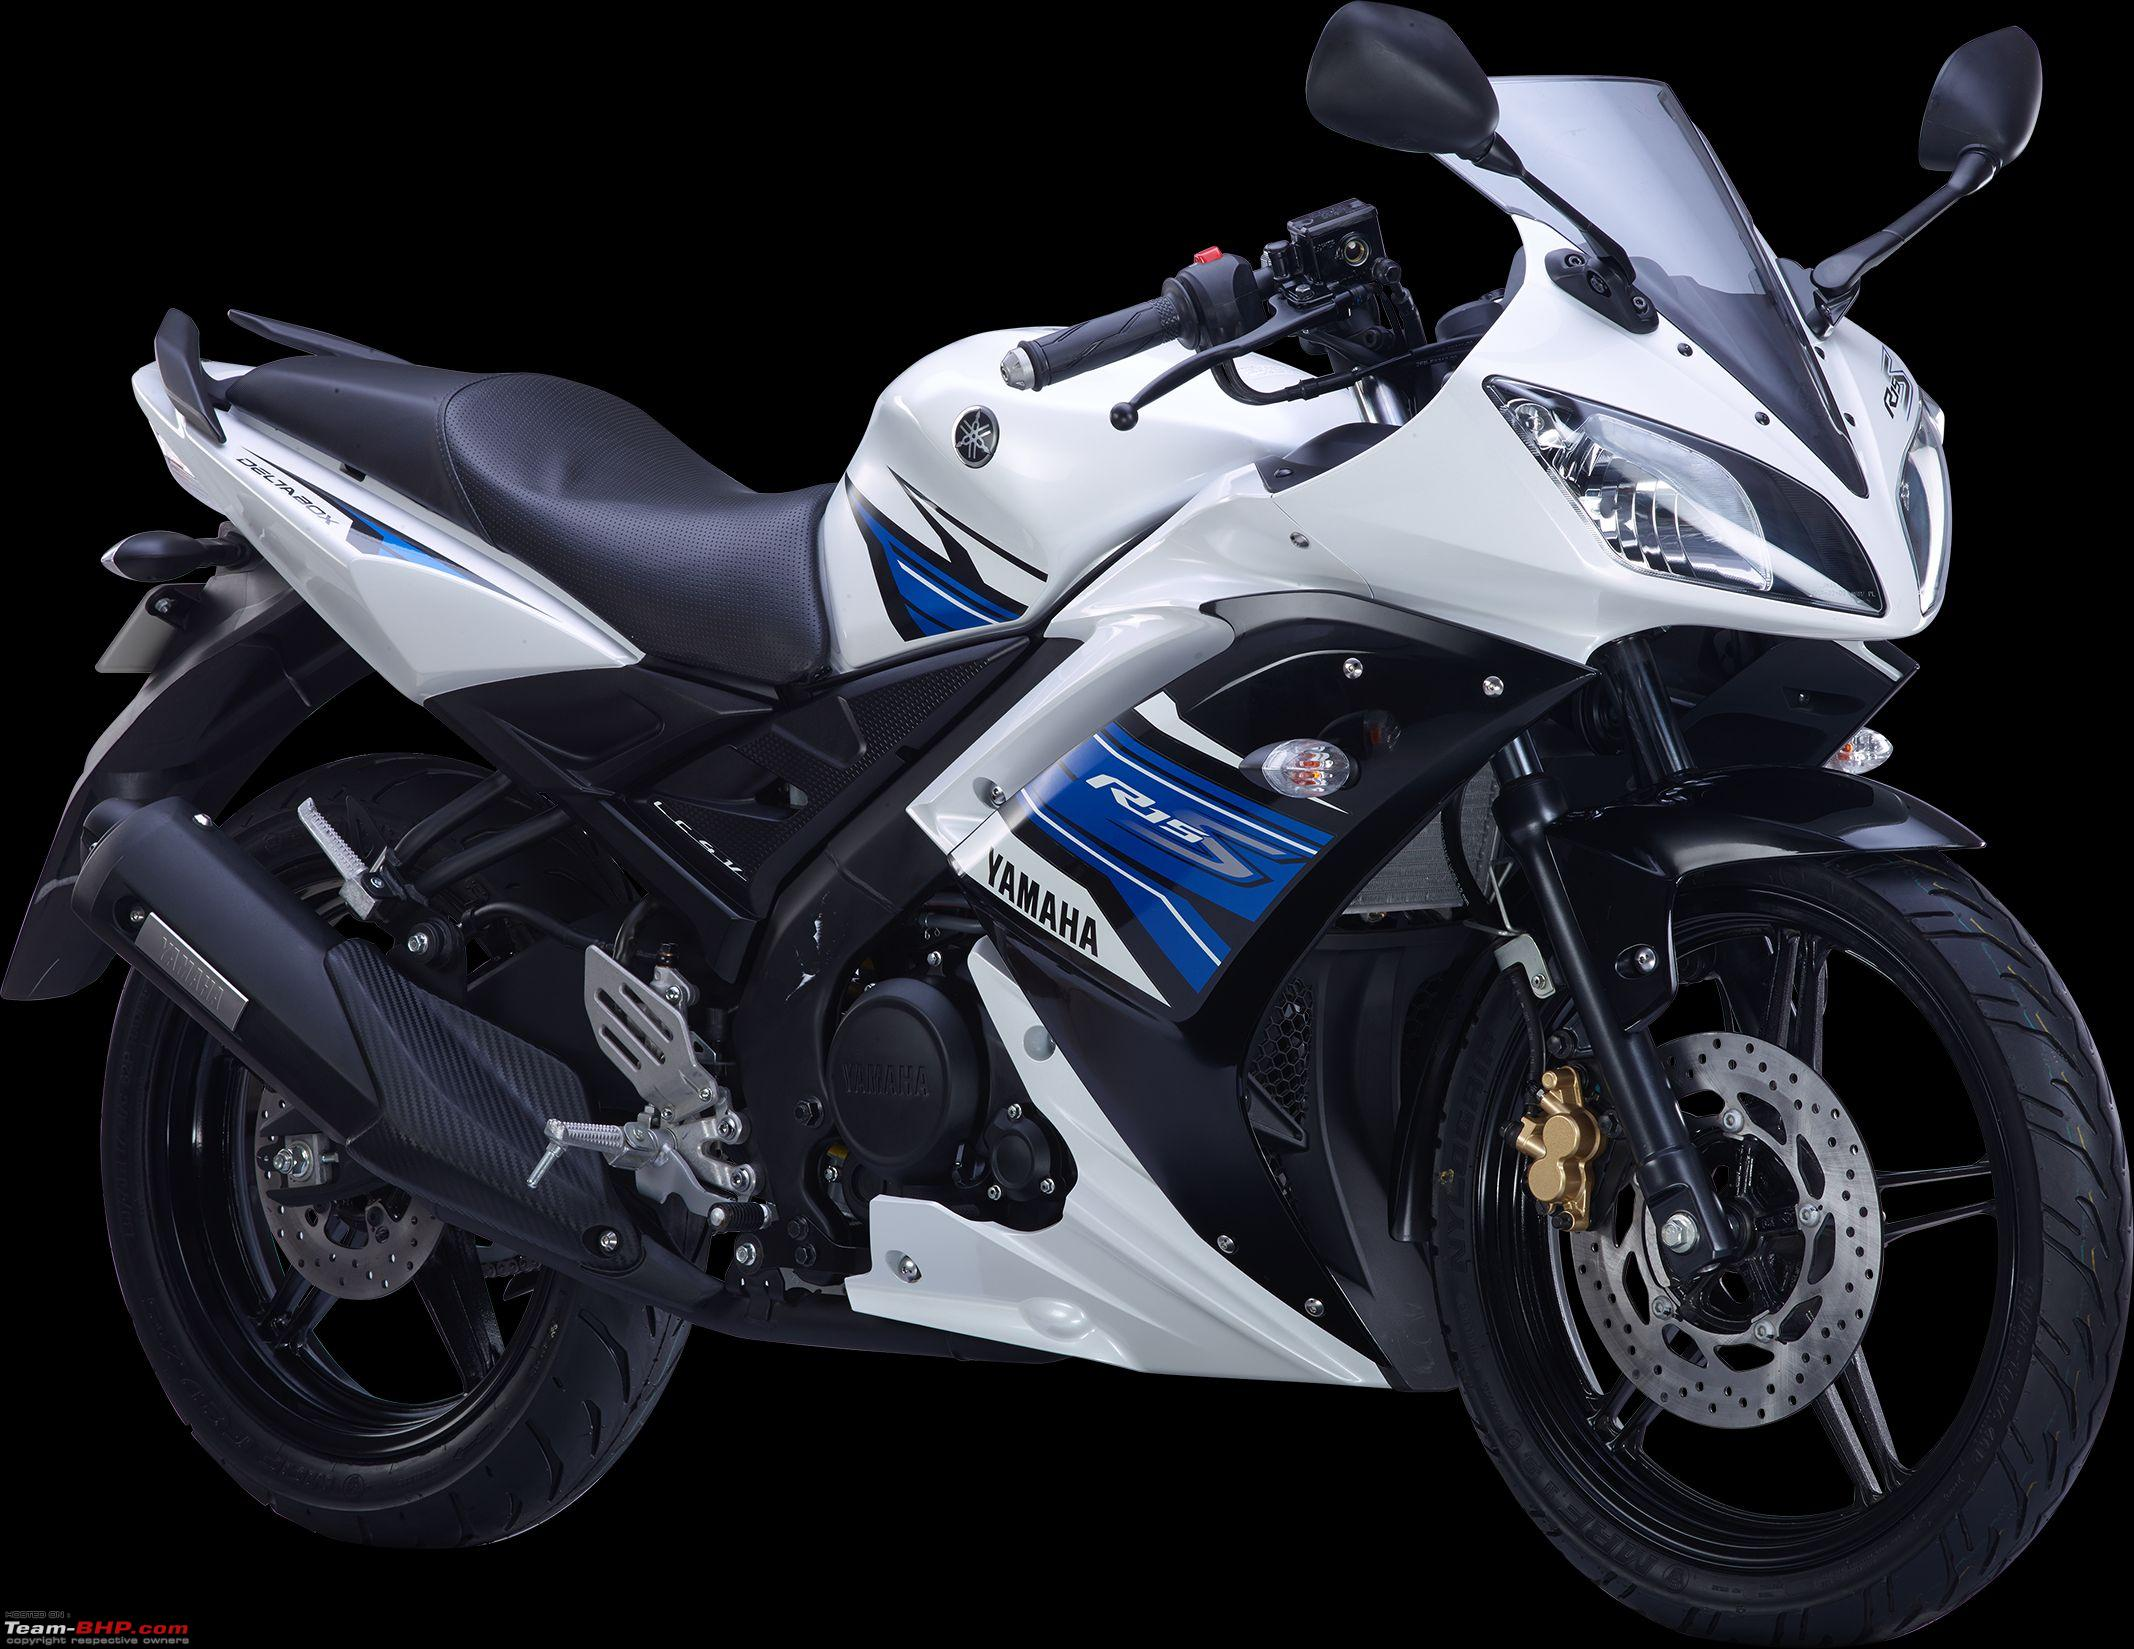 Images of Yamaha YZF-R15 | 2134x1649